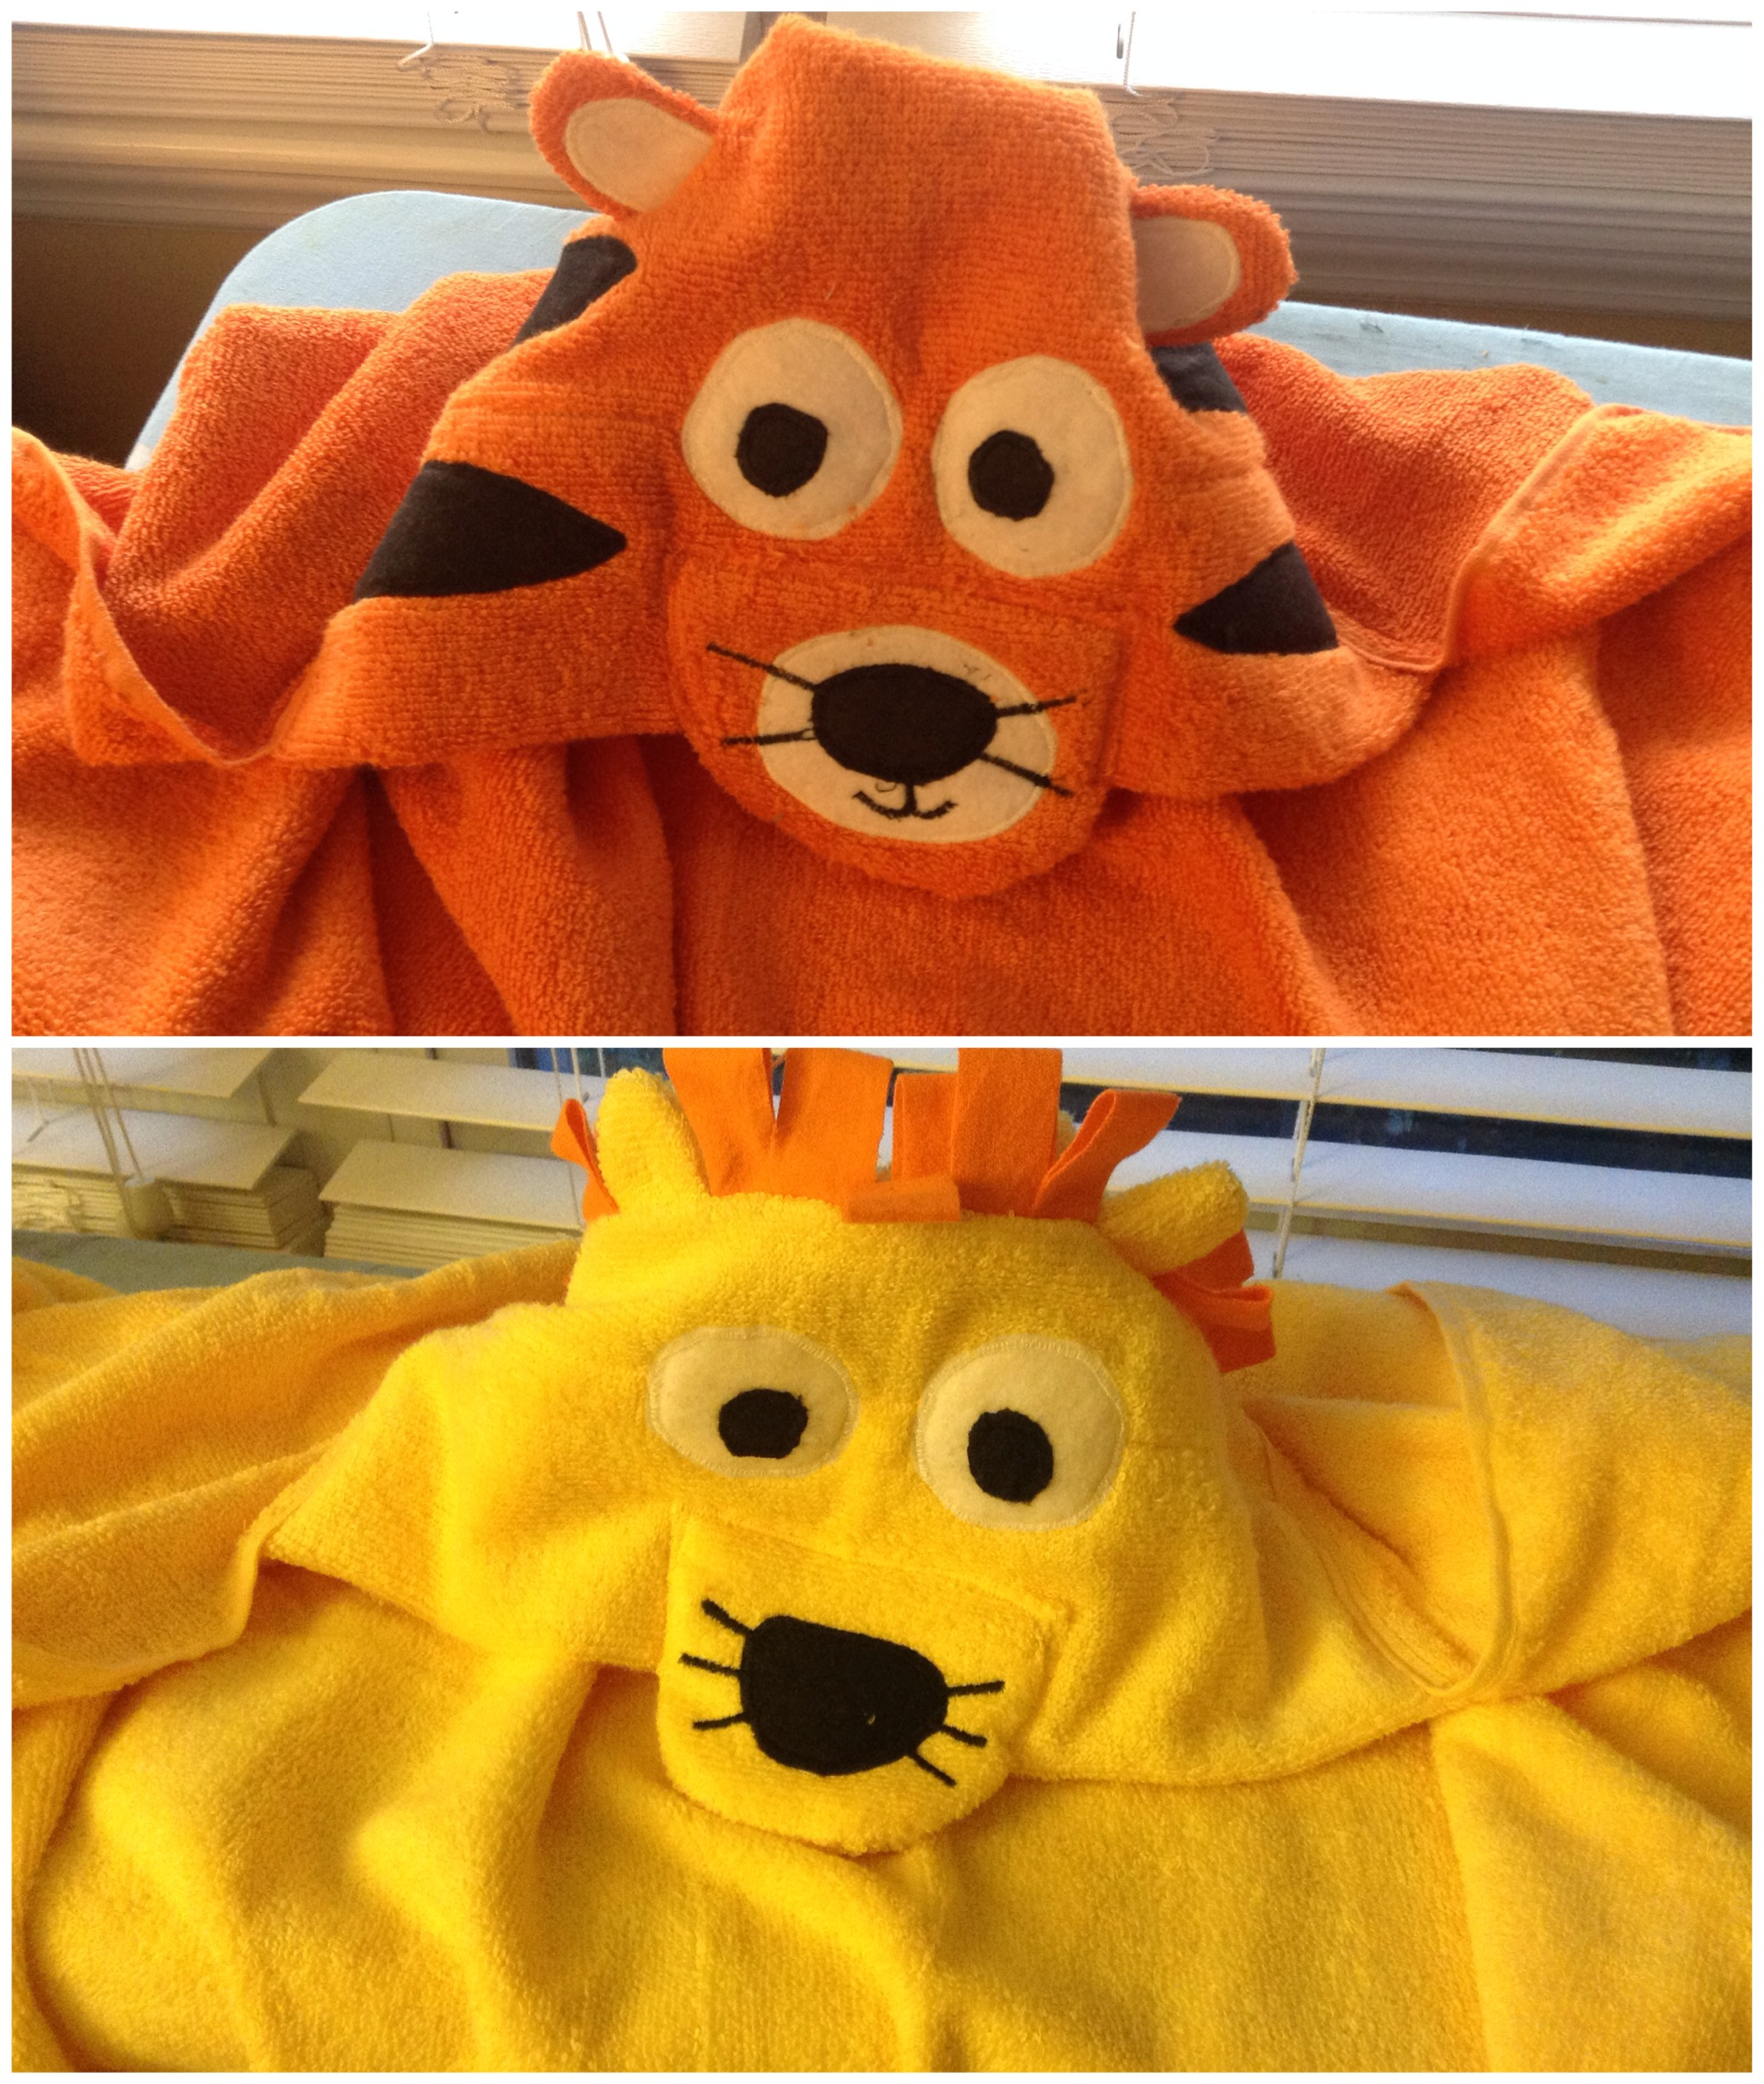 Handmade Gifts for Kids Roundup